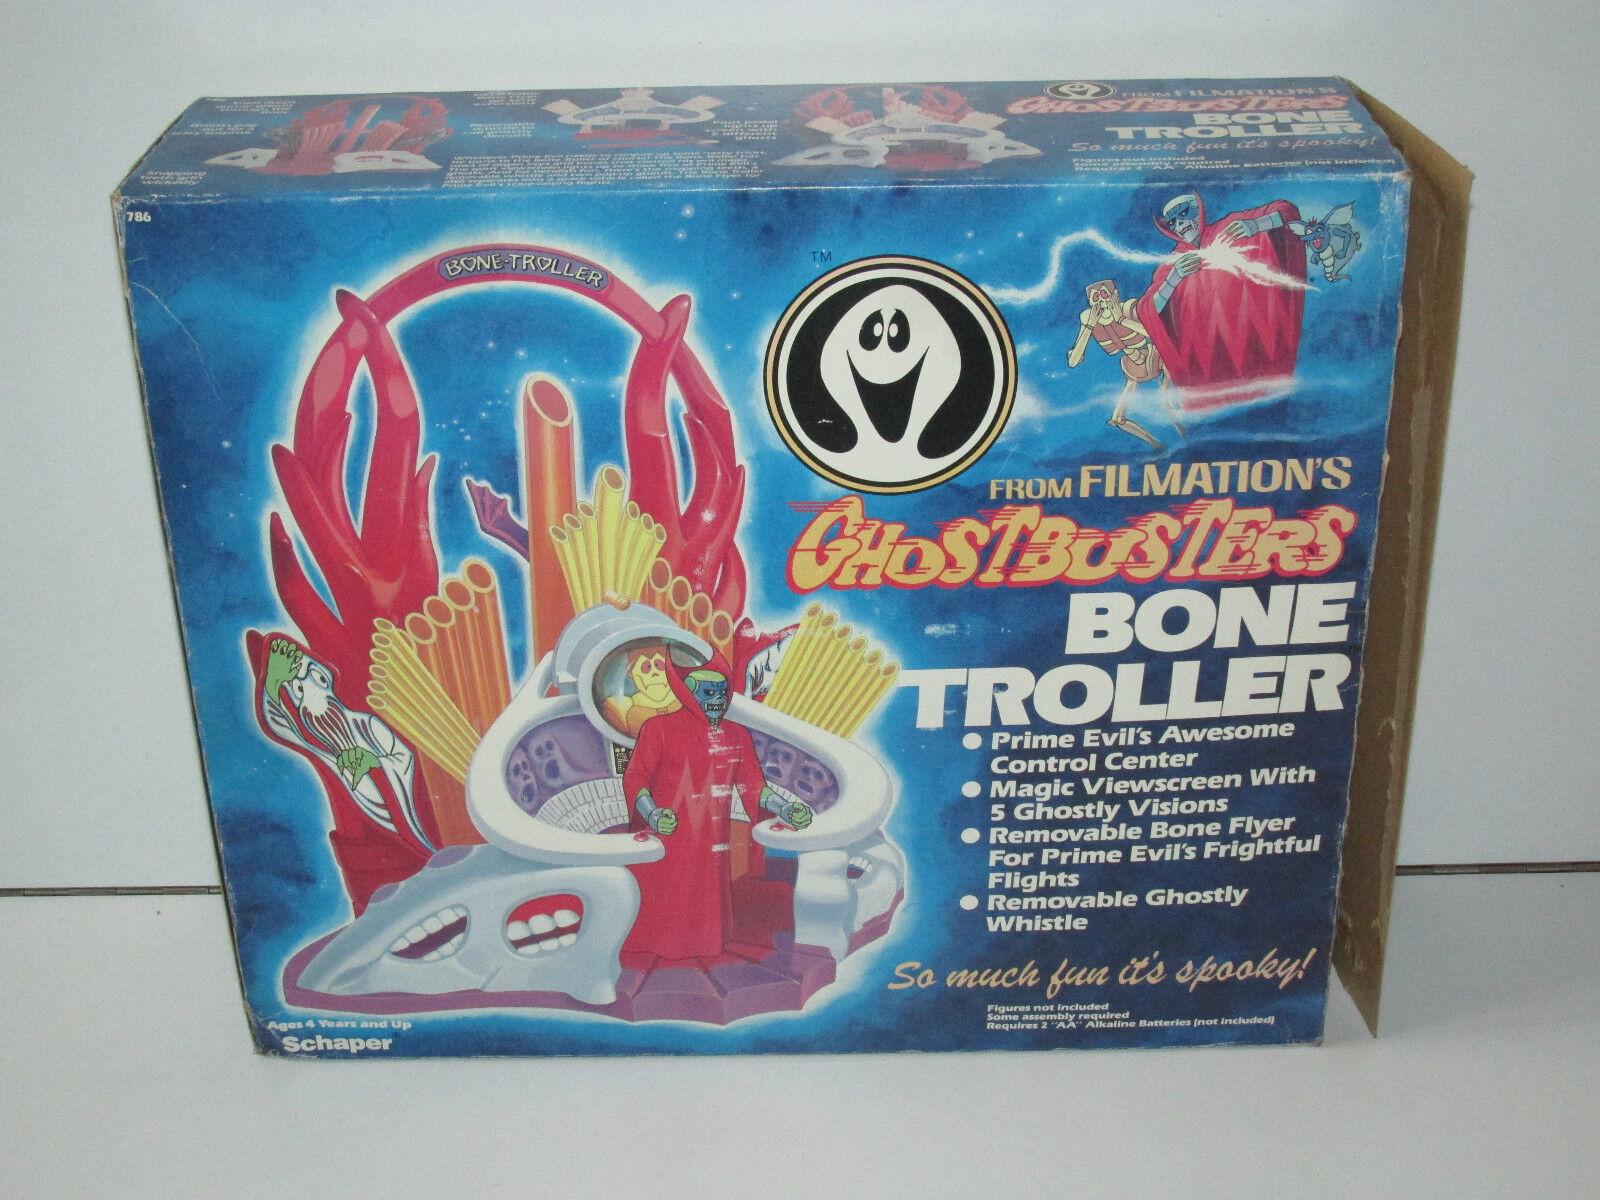 FILMATION GHOSTBUSTERS BONE TROLLER 100% COMPLETE BOXED MIB 1985 SCHAPER